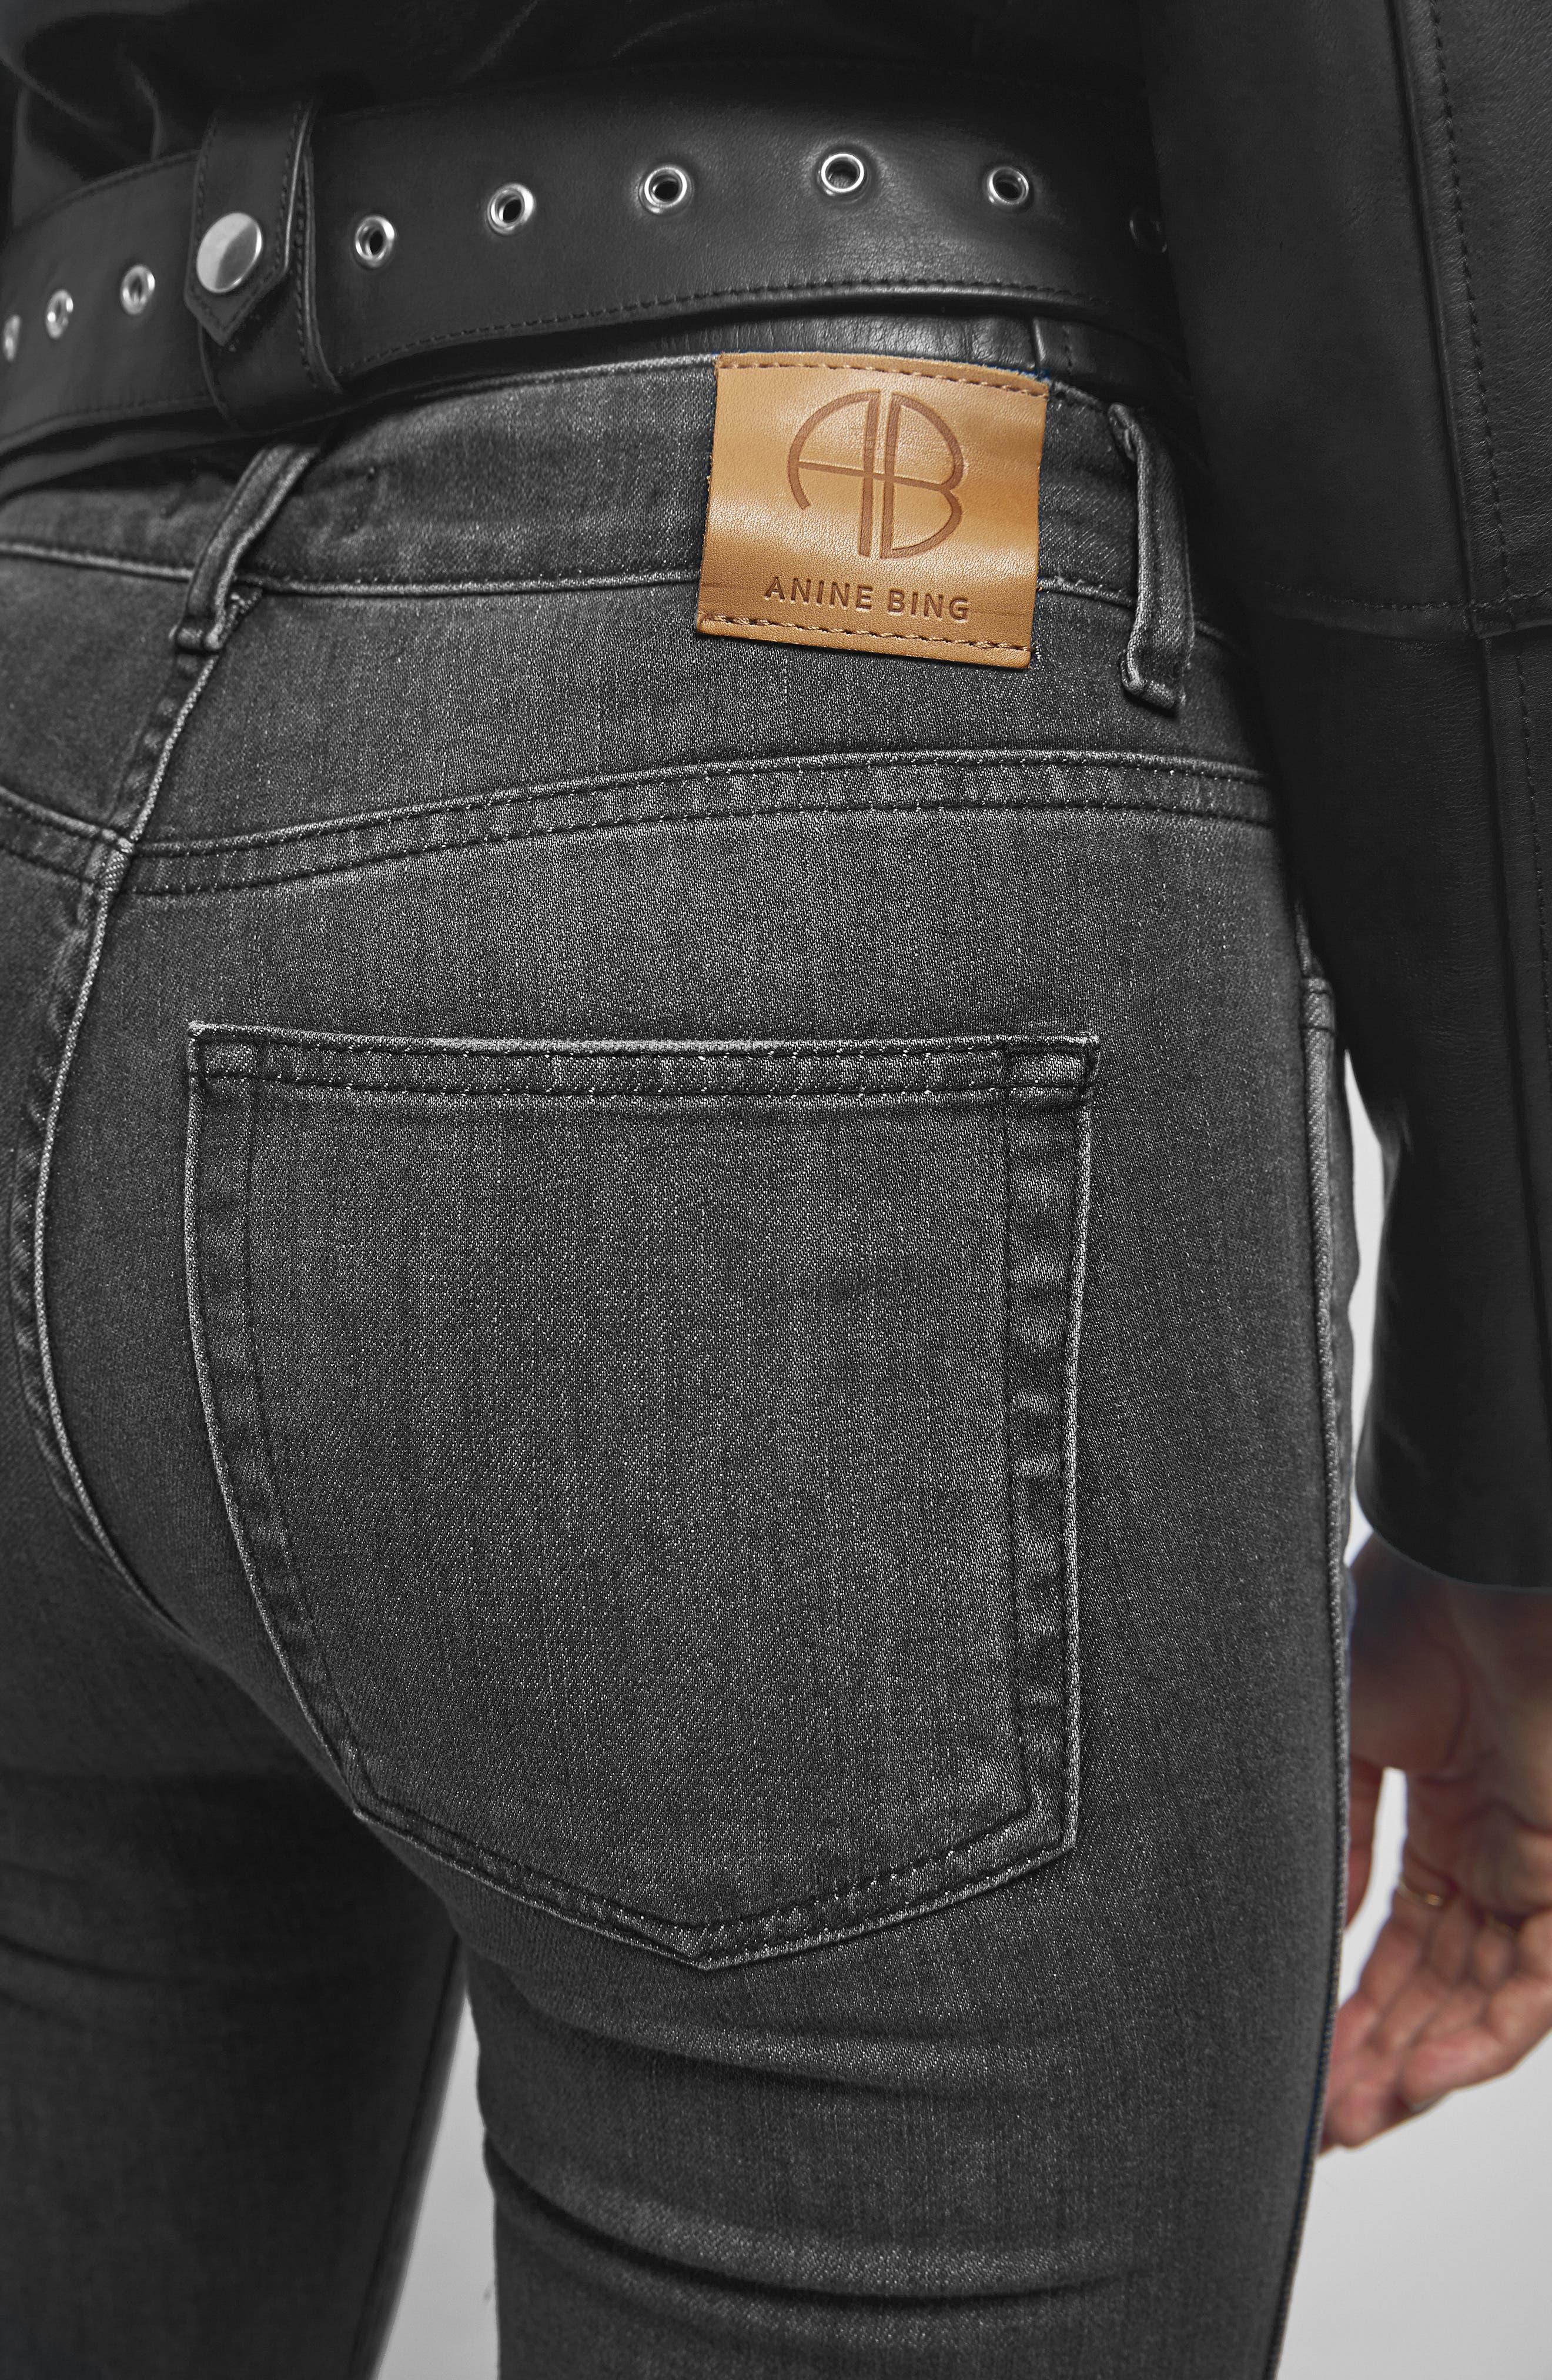 Kara Skinny Jeans,                             Alternate thumbnail 4, color,                             CHARCOAL